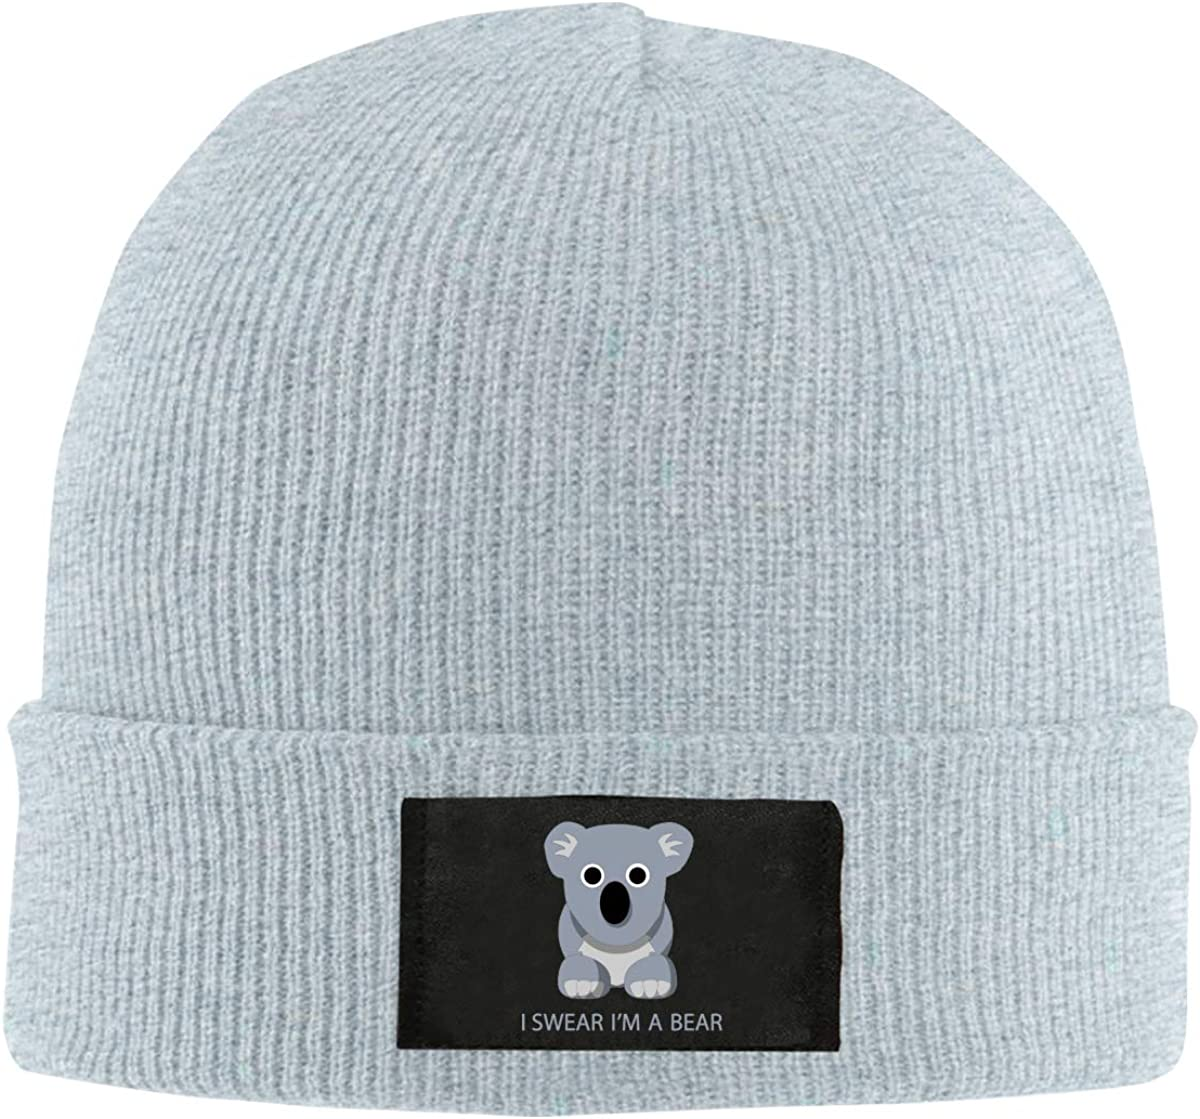 Unisex Stylish Slouch Beanie Hats Black I Swear Im A Bear Top Level Beanie Men Women